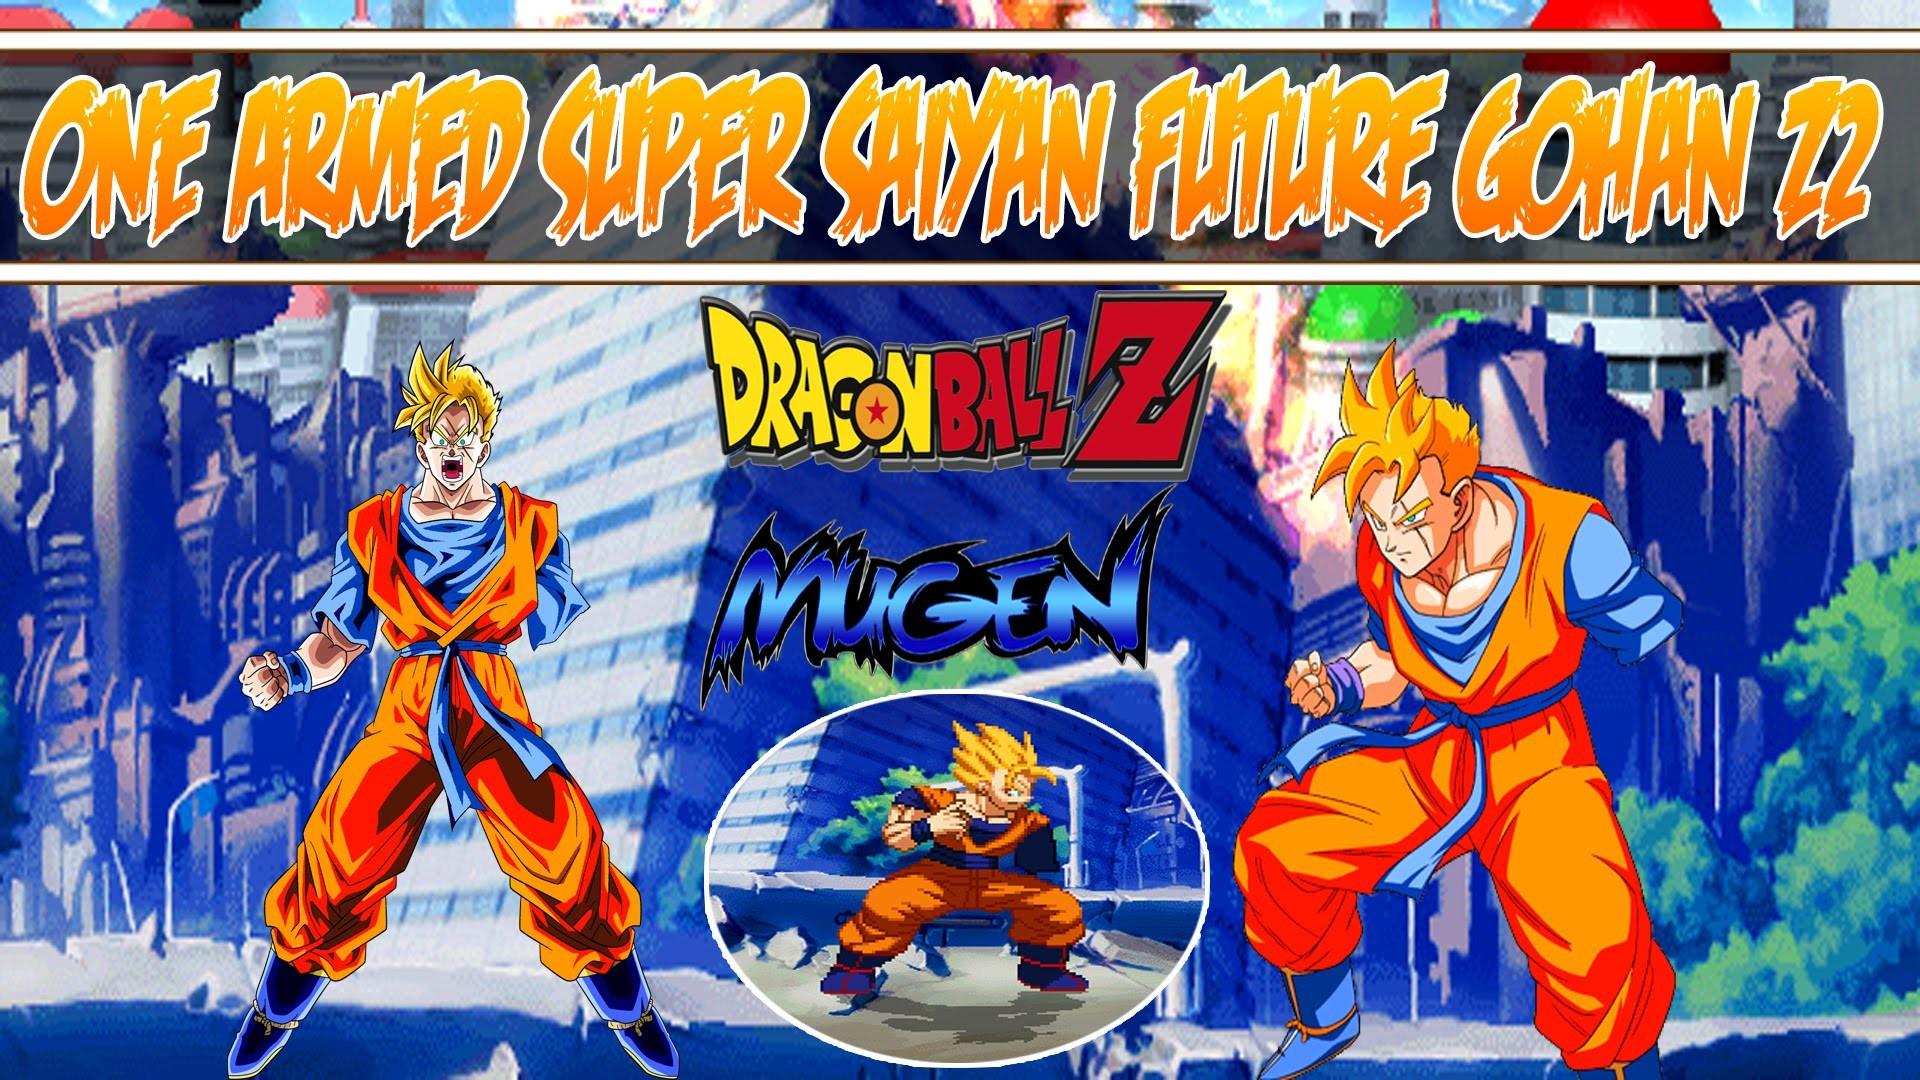 M.U.G.E.N. CHAR | One Armed Super Saiyan Future Gohan Z2 by  CaptainUnprofessional – YouTube